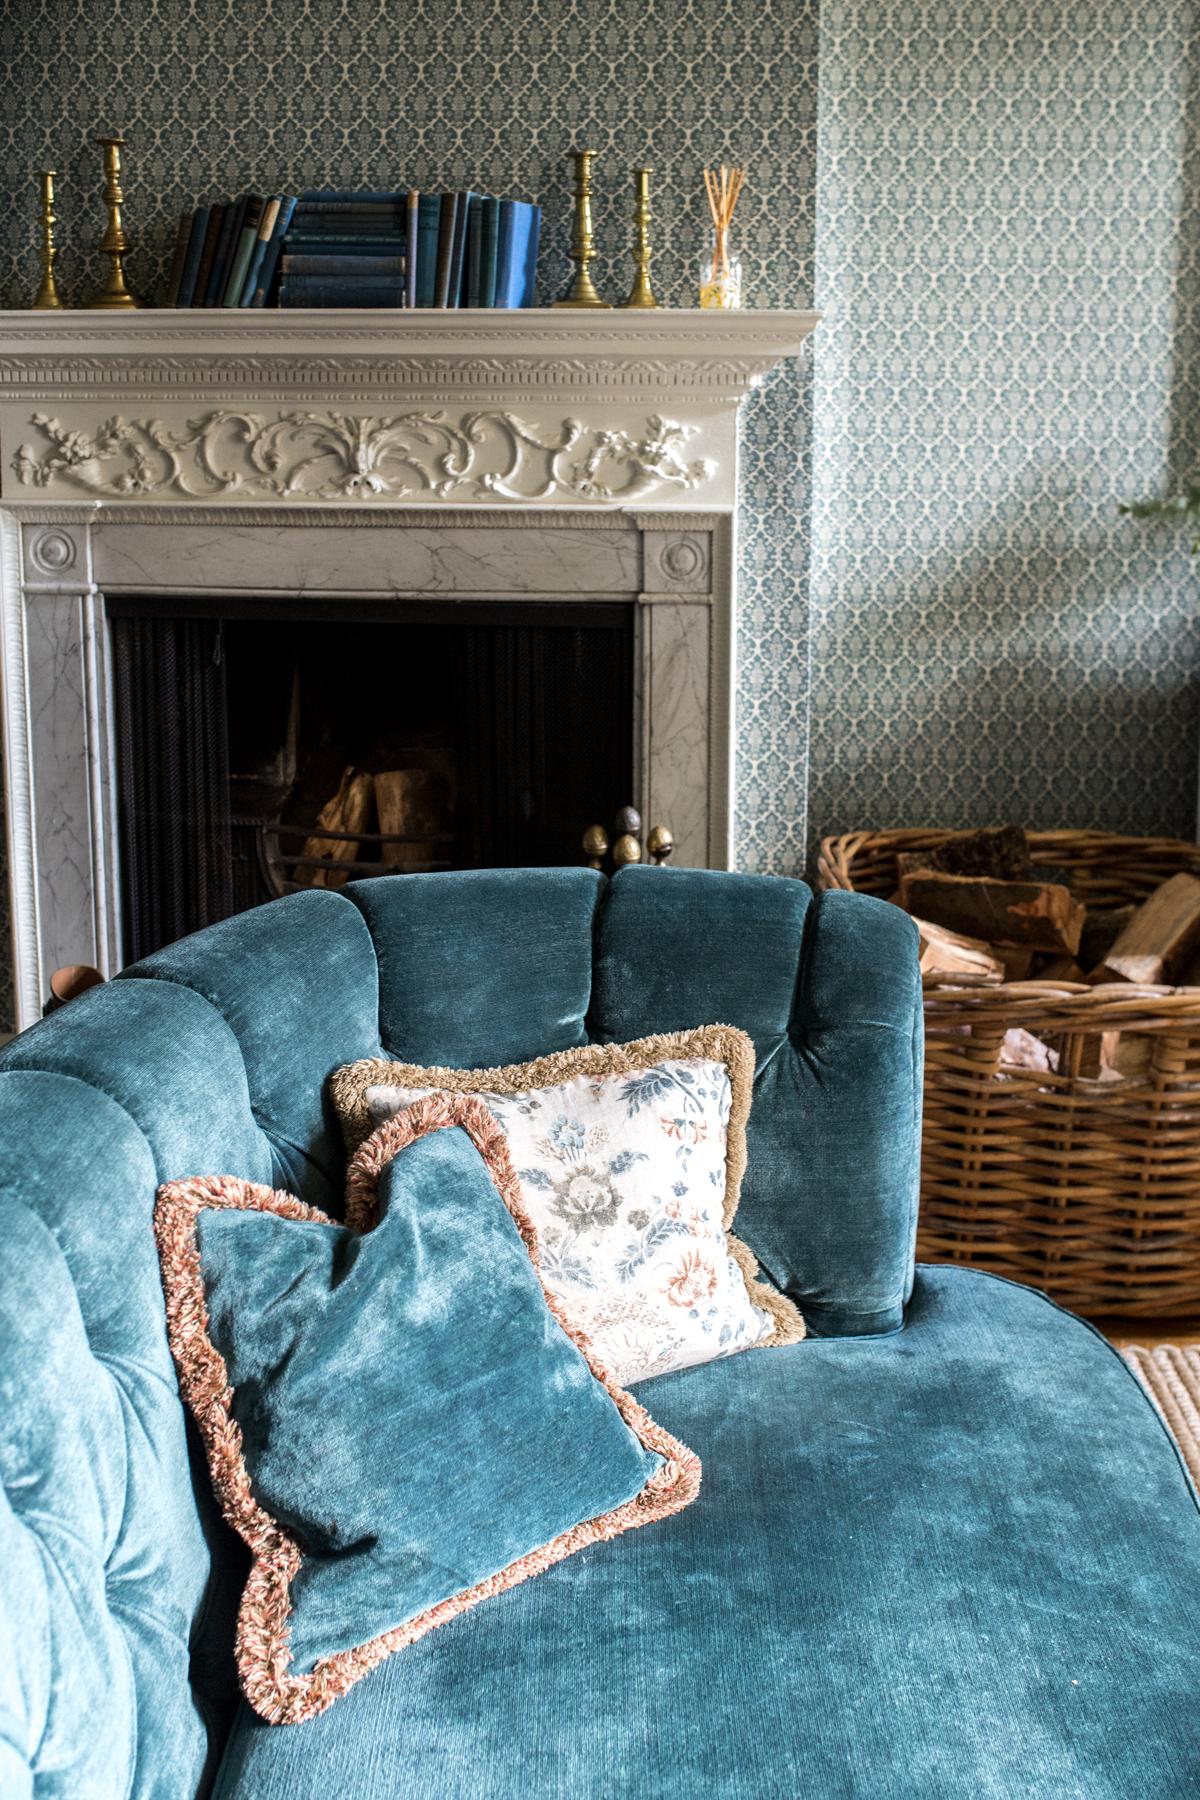 Stacie Flinner Soho House Babington House England-18.jpg